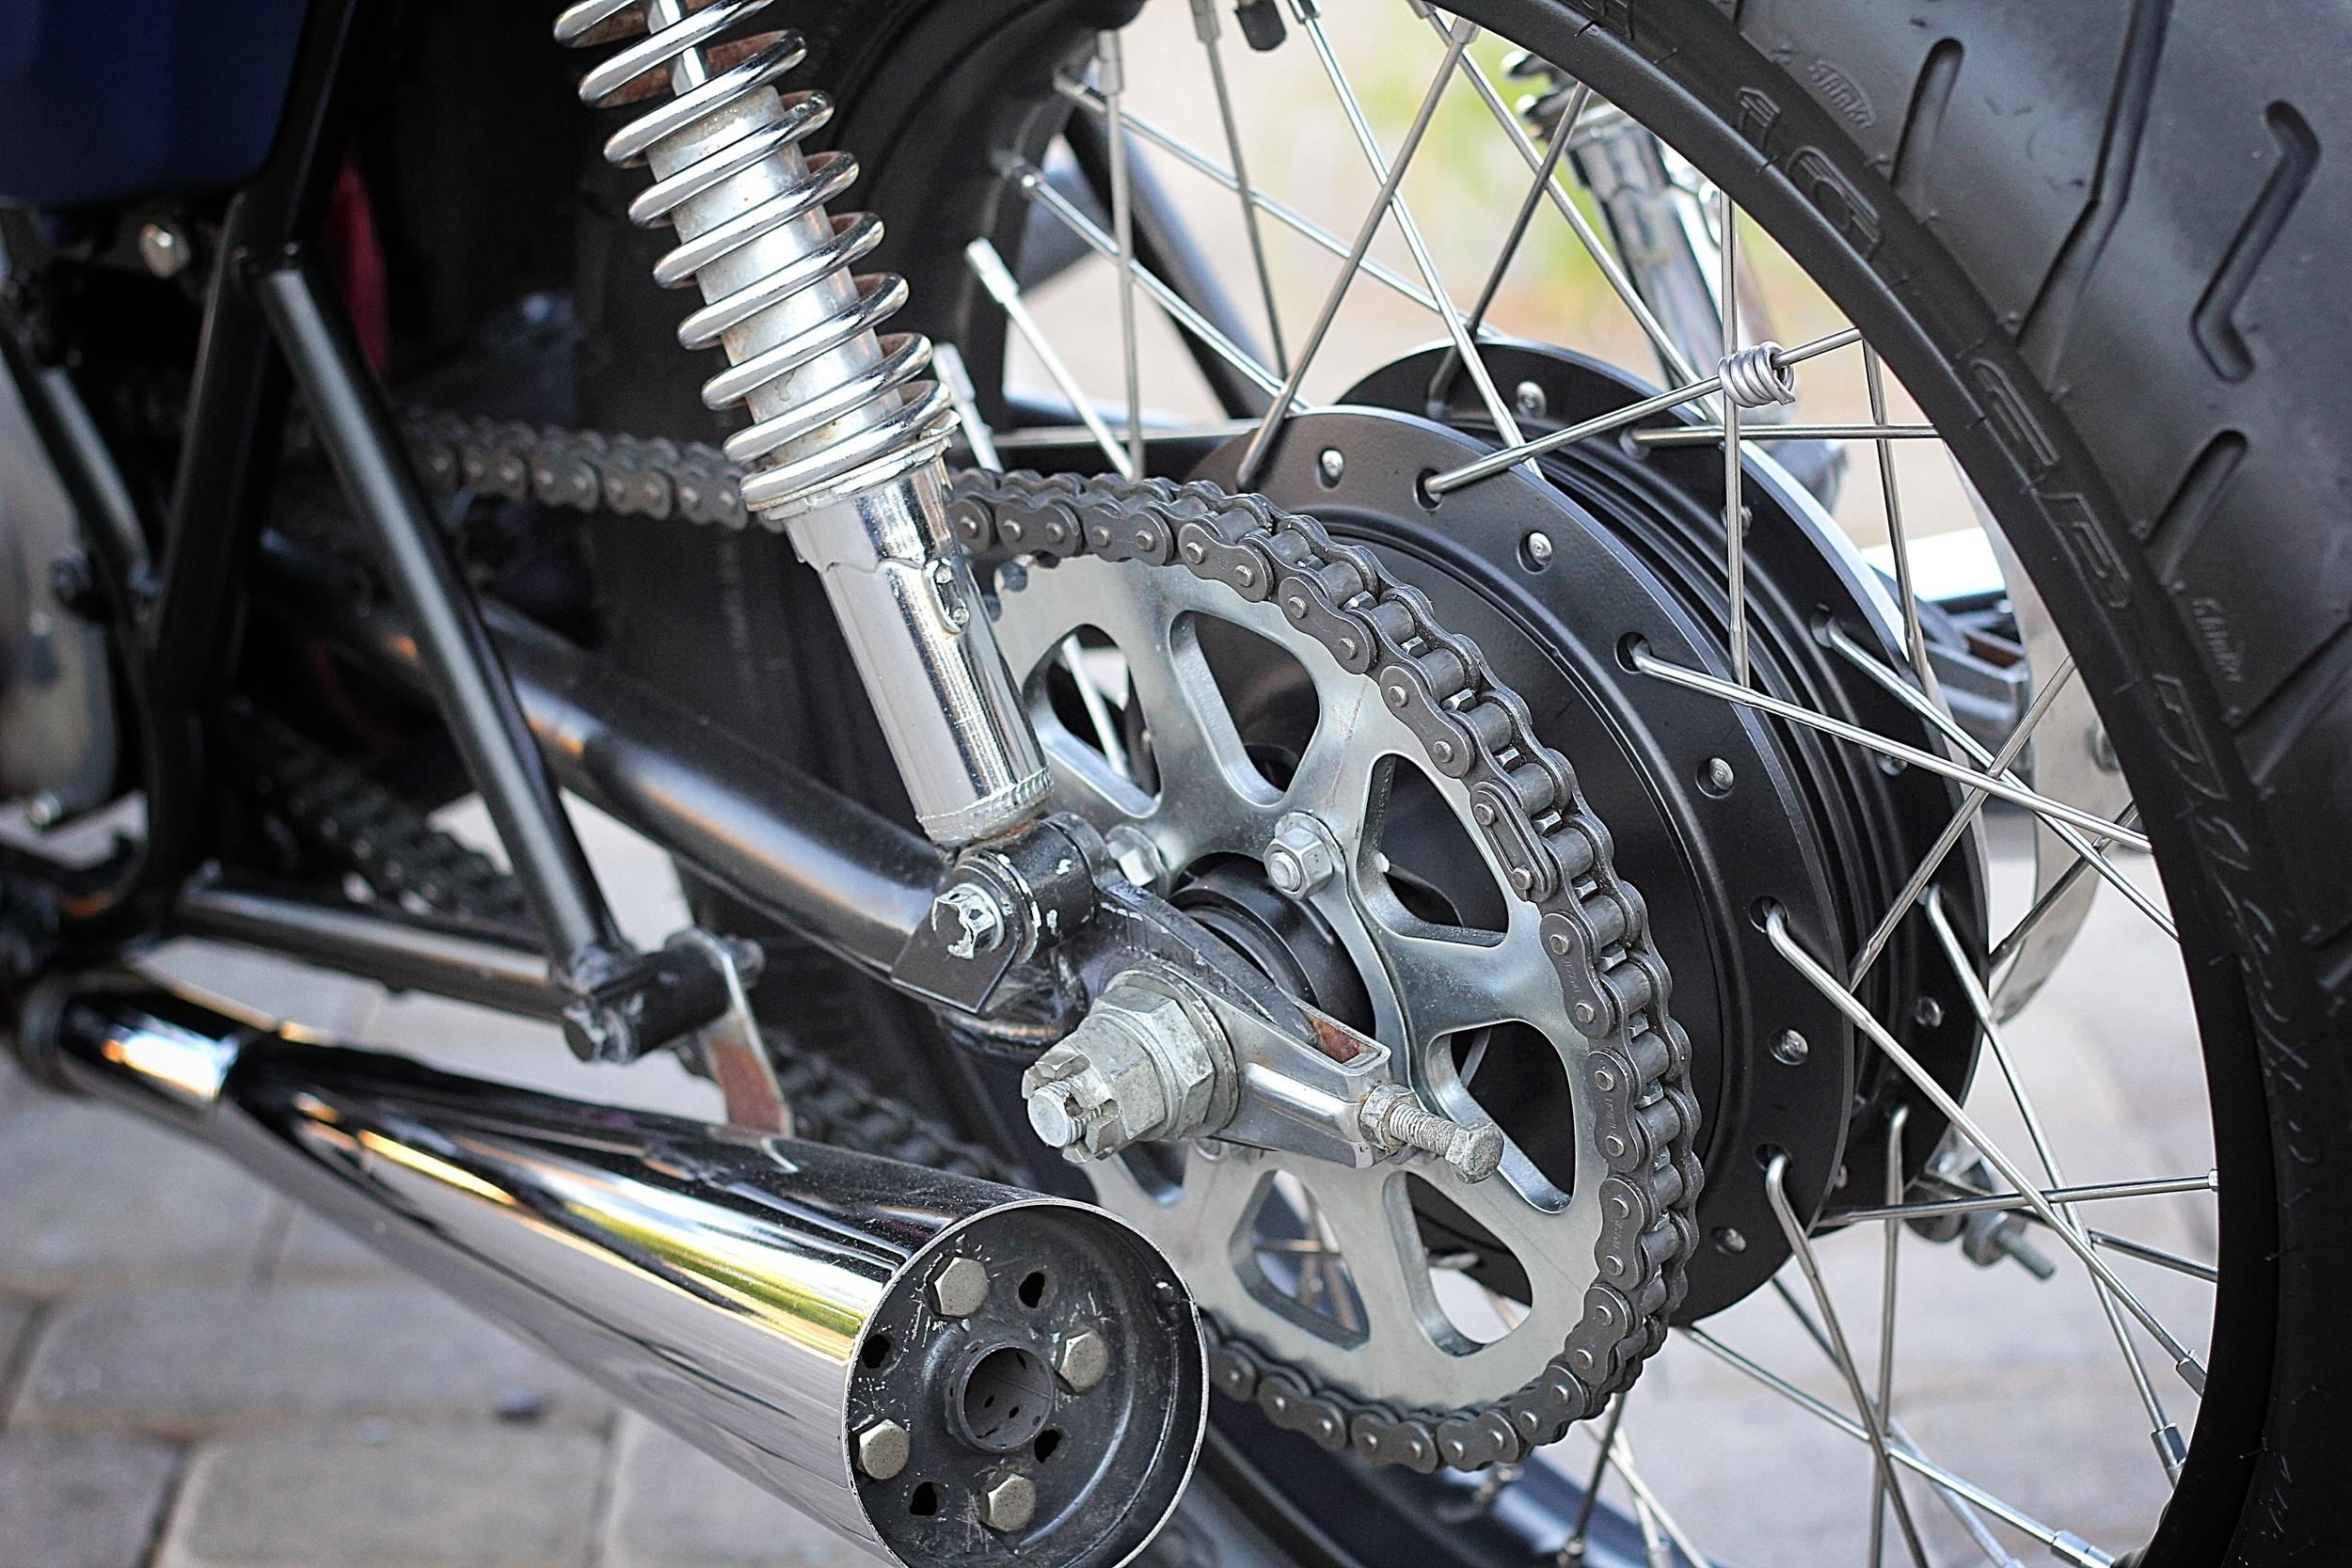 shiftcraft_kz400_rear_hub.jpg